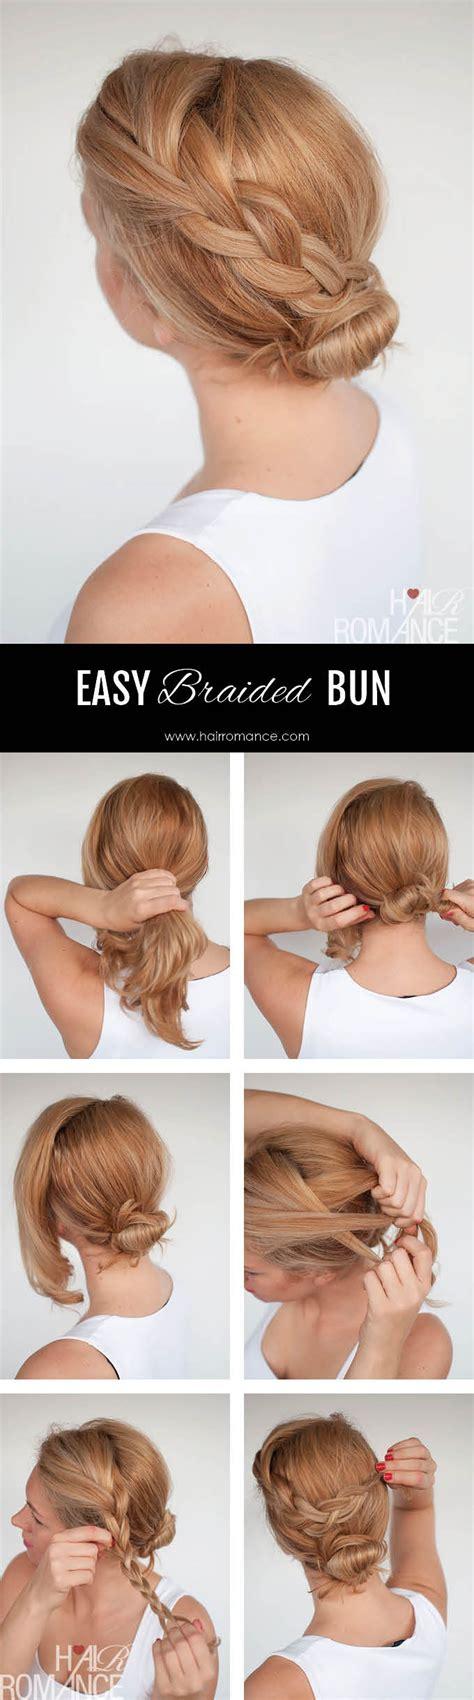 tutorial html simple upskill your work bun with this simple braid tutorial